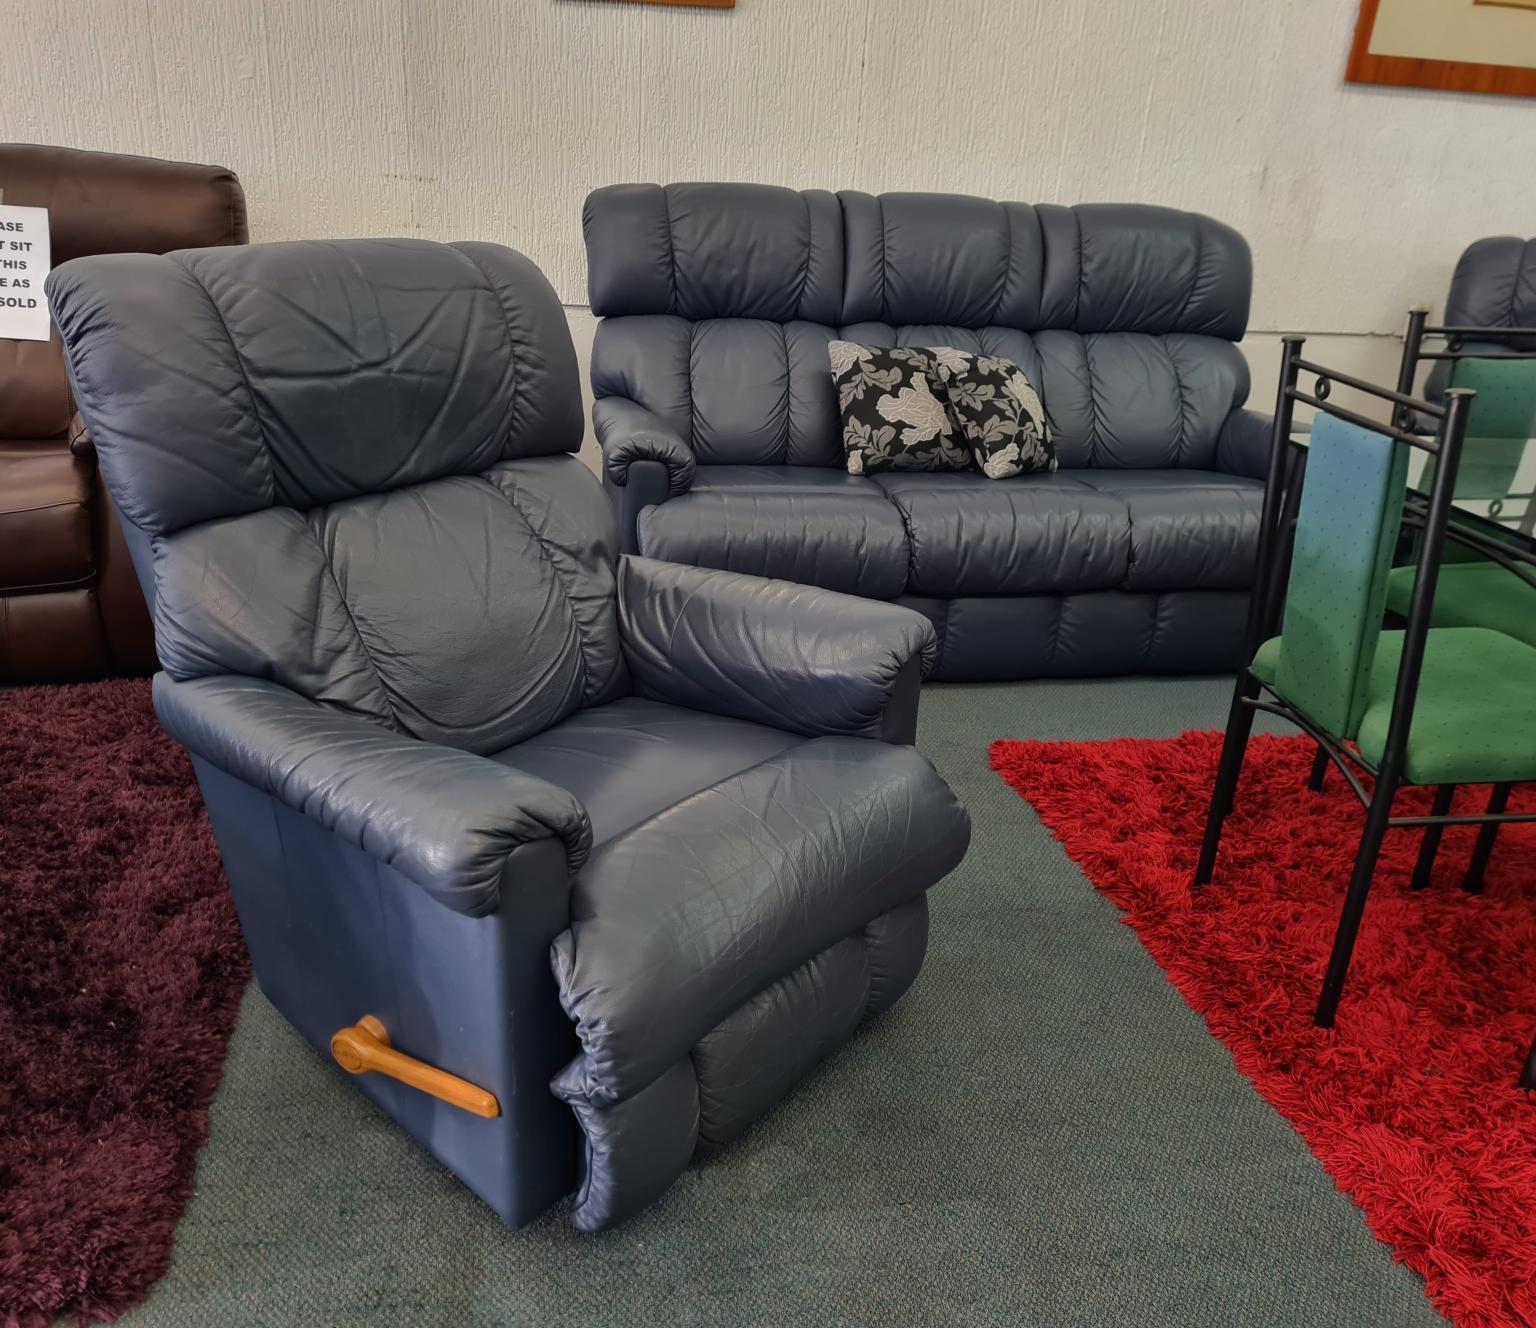 3-Piece Genuine Leather La-Z-Boy Lounge Suite